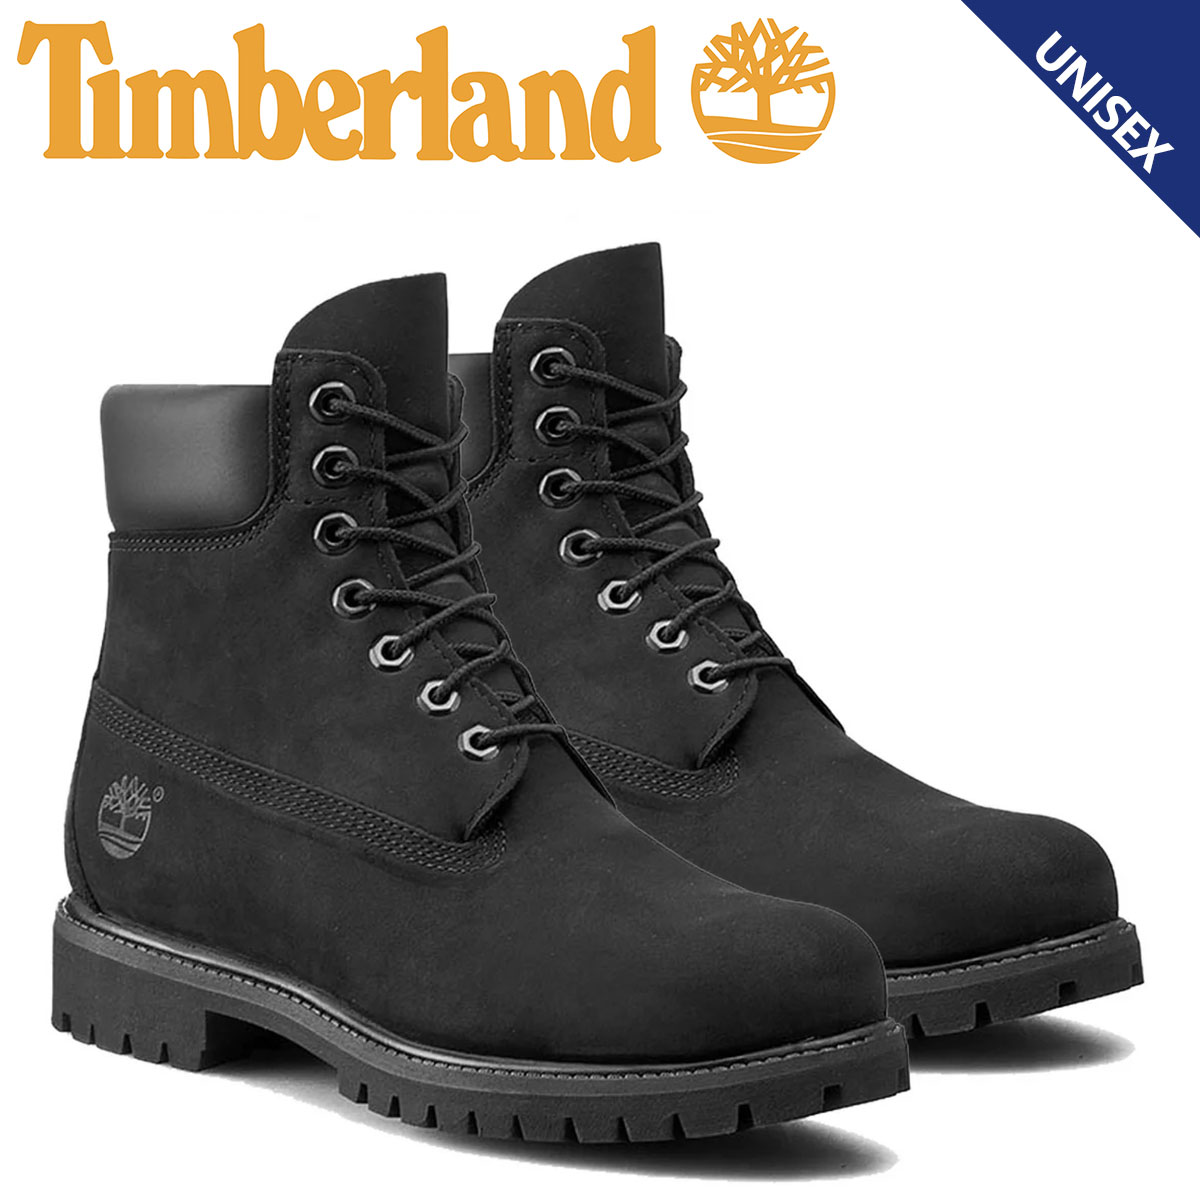 Whats up Sports Rakuten Global Market Timberland Timberland 6 INCH 6 inch premium waterproof boots 6 INCH PREMIUM WATERPROOF BOOTS 10073 men women